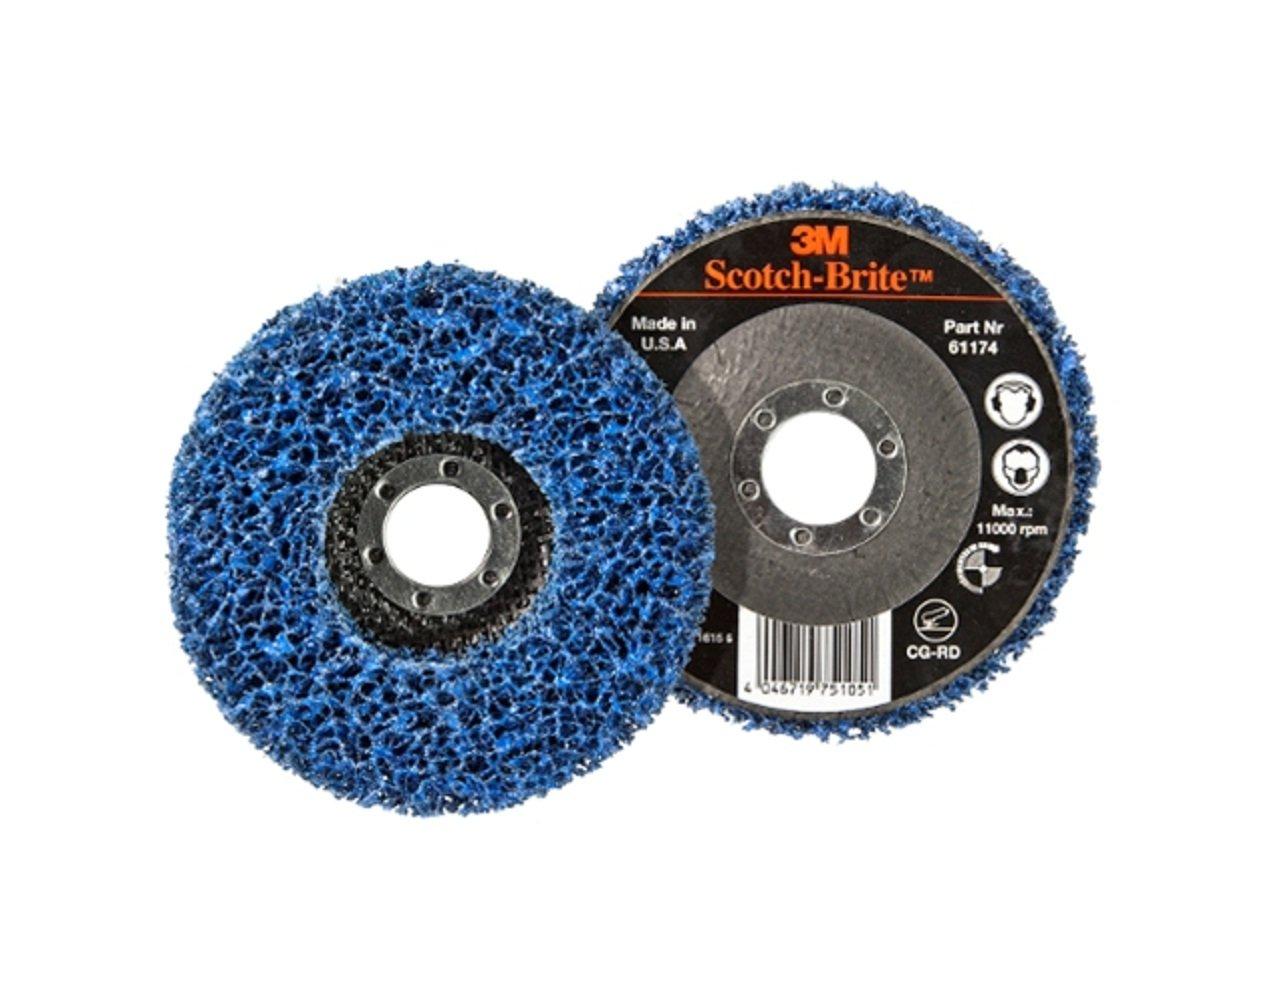 3M Scotch-Brite CG-RD 115 x 22mm GP Rigid Clean and Strip Disc Blue